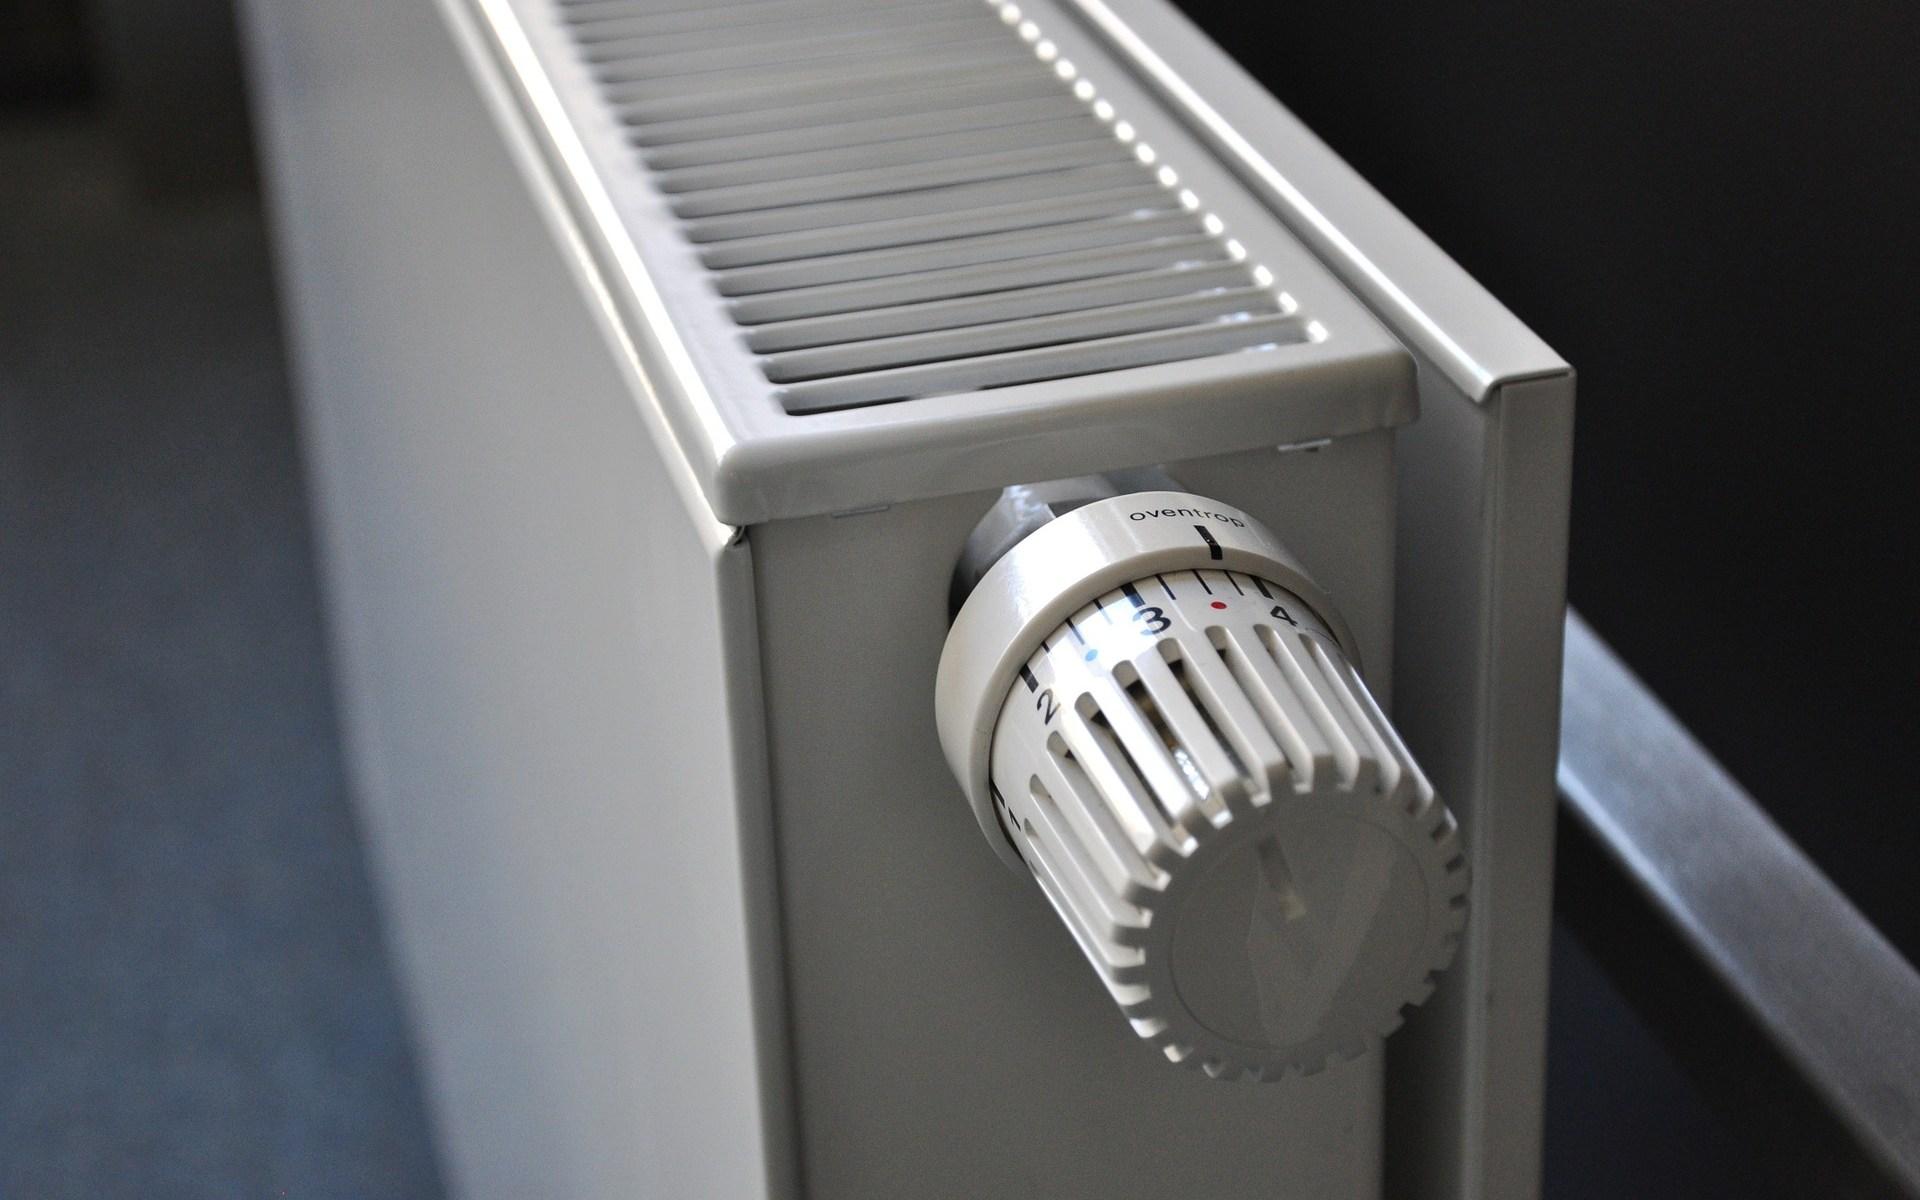 SEMA Wien 1160 Sanitätsausstattung, Sanitärhandel & Installateur Notdienst Wien Umgebung sema_radiator-heizung-gas-wasser-wien-installateur-notdienst_1920x1280